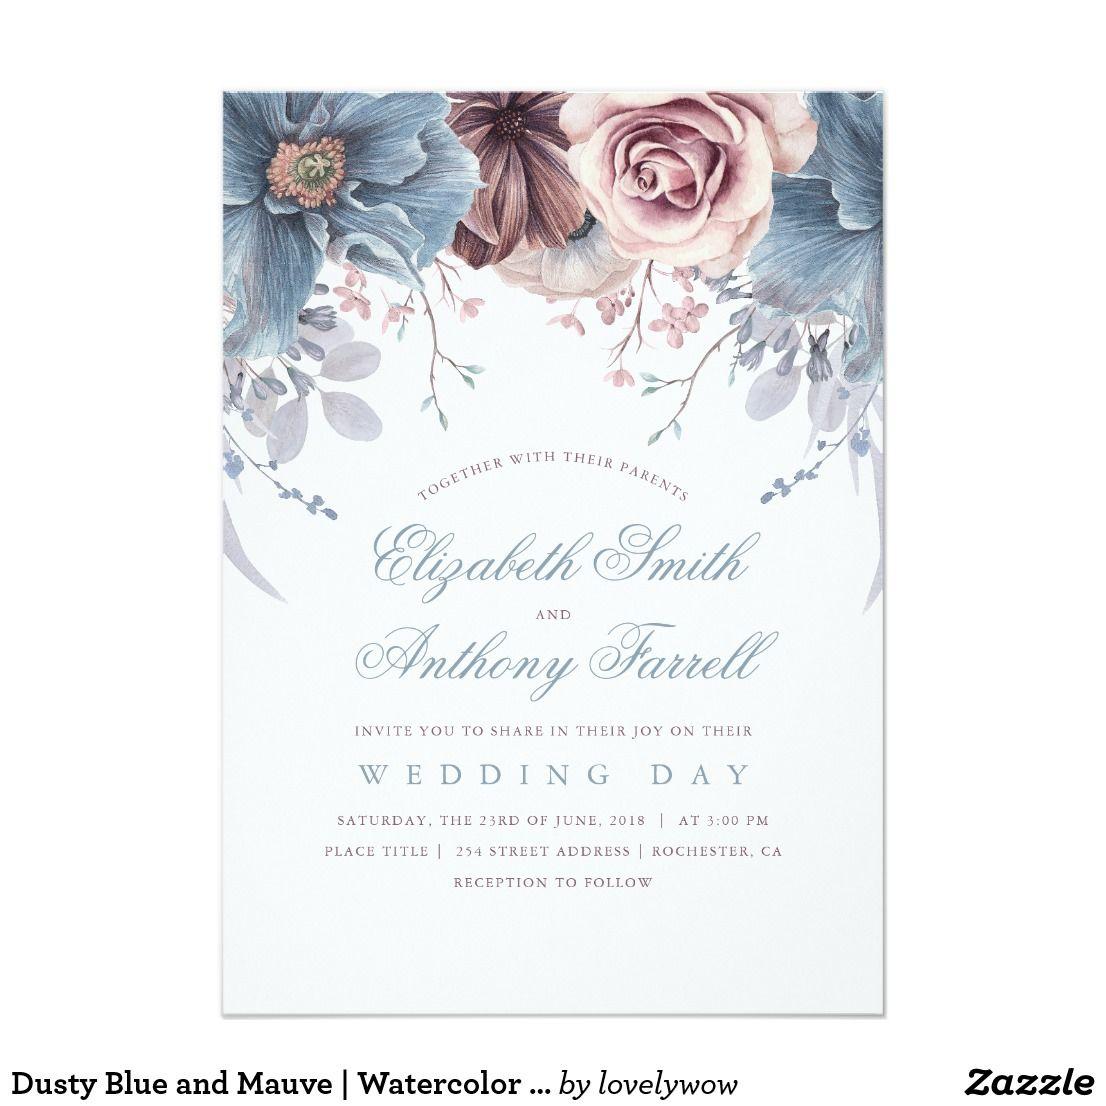 Wedding Shower Engagement Event Invitation Suite Grey Rose Gold Printable Digital File Printed Invite Invitations Stationery